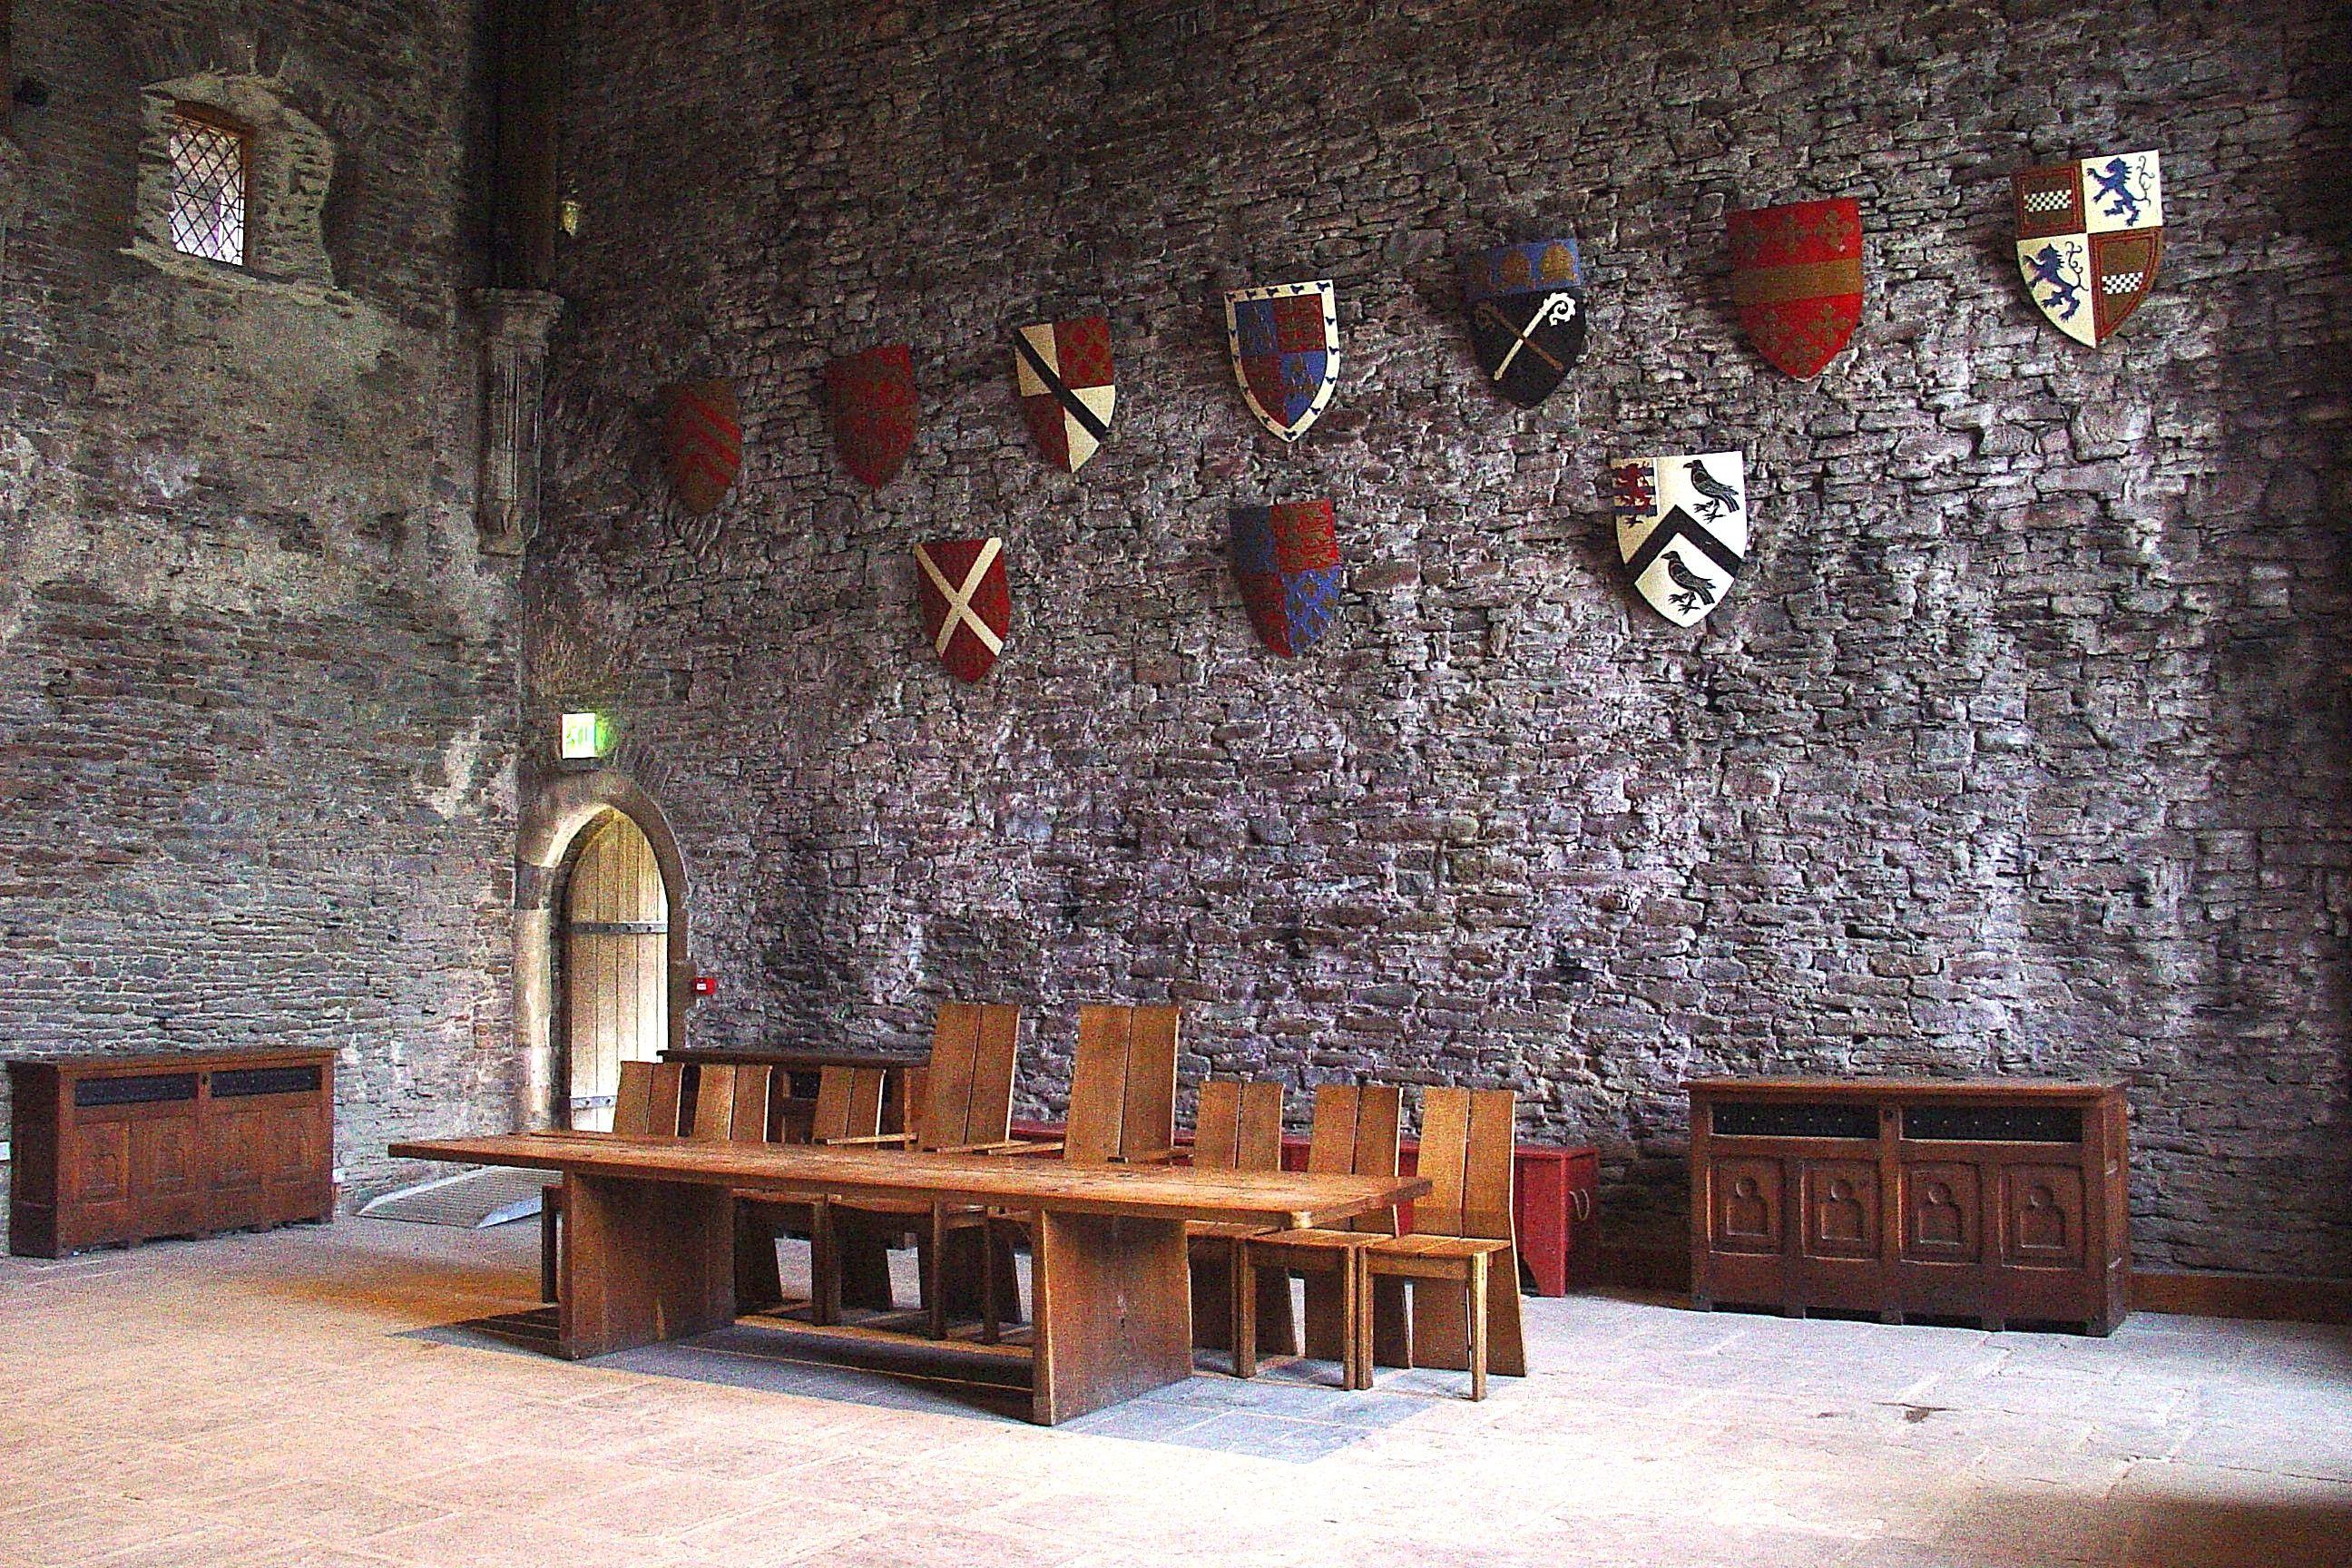 Caerphilly Castle Travel Castles Interior Medieval Castle Castles In Wales